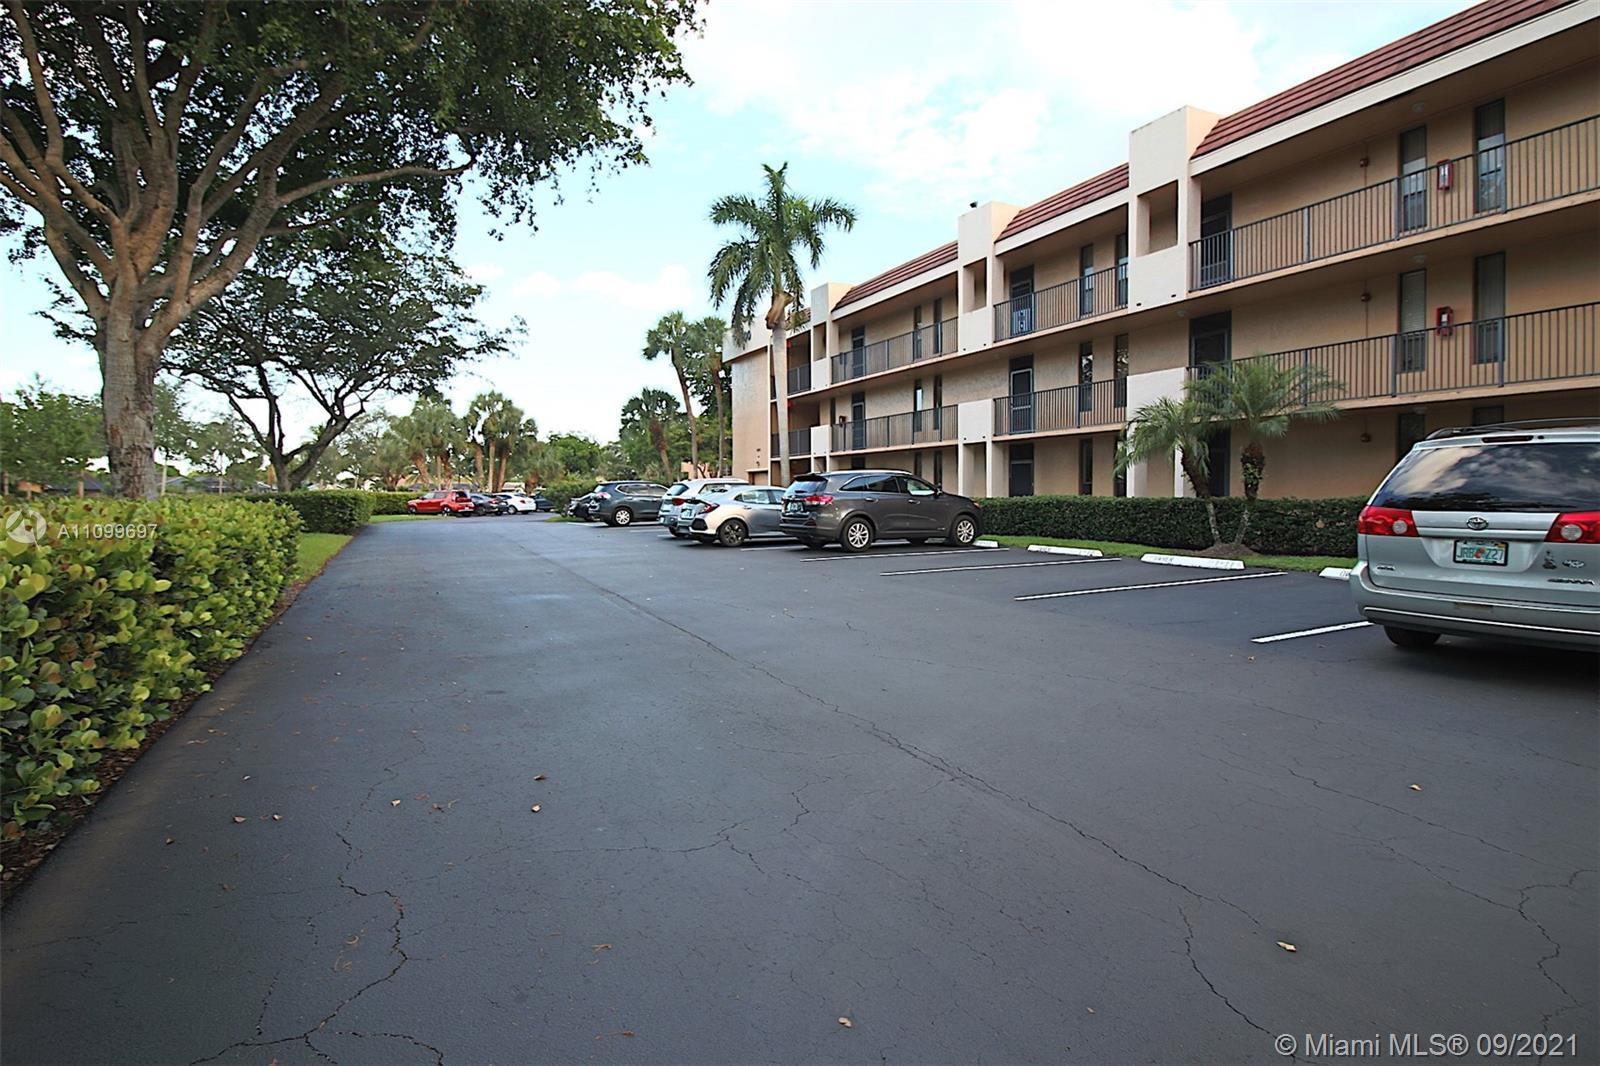 5606 Coral Lake Dr Unit 106, Margate, Florida 33063